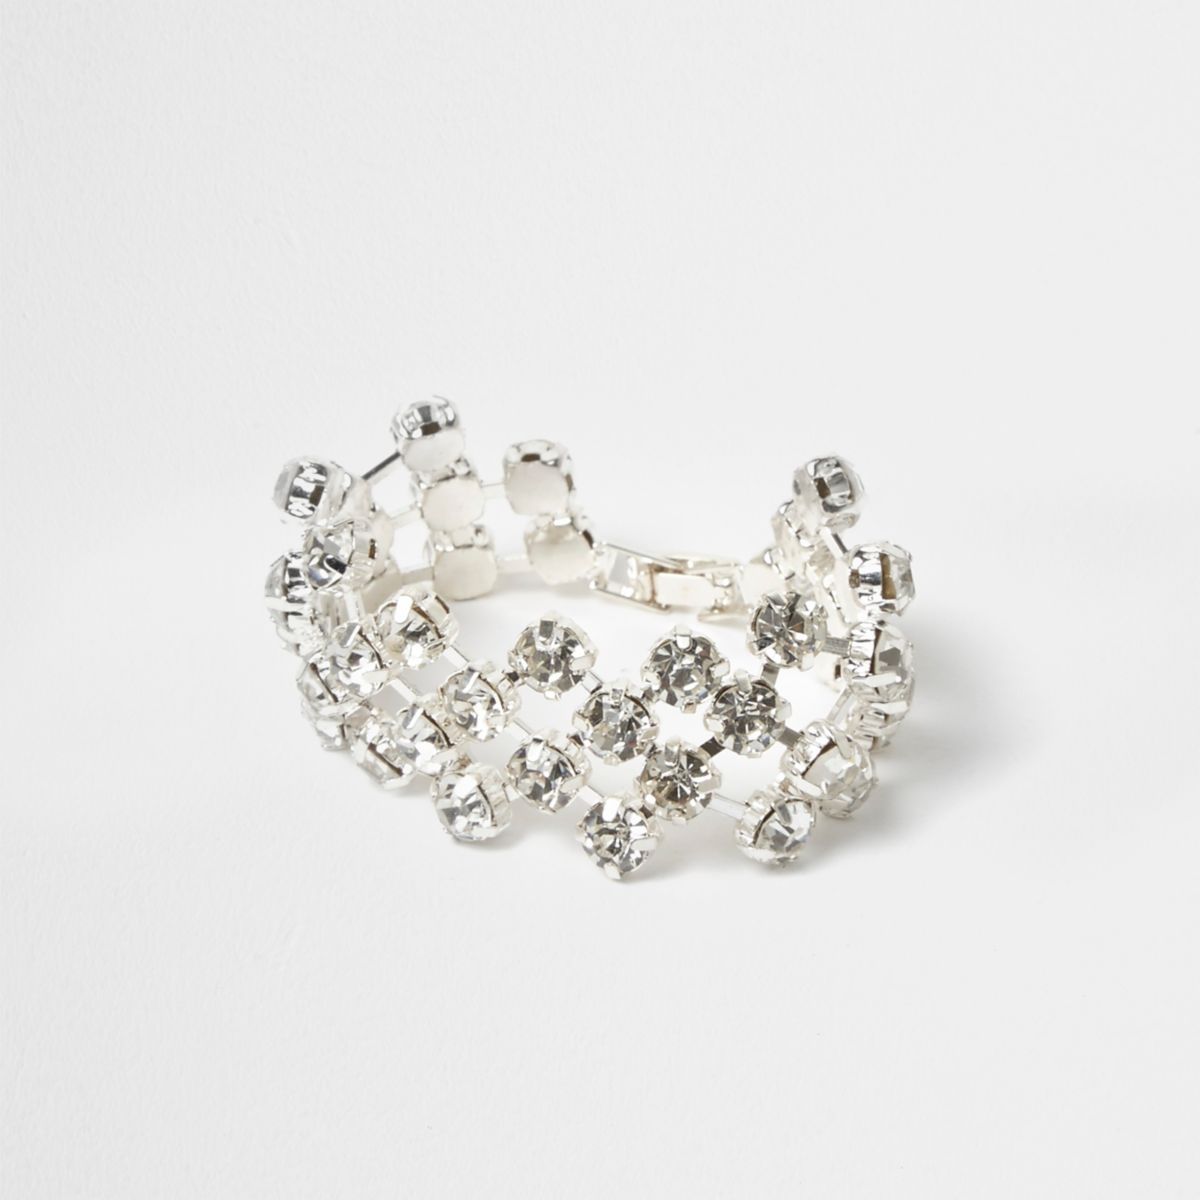 Silver tone diamante cup chain bracelet